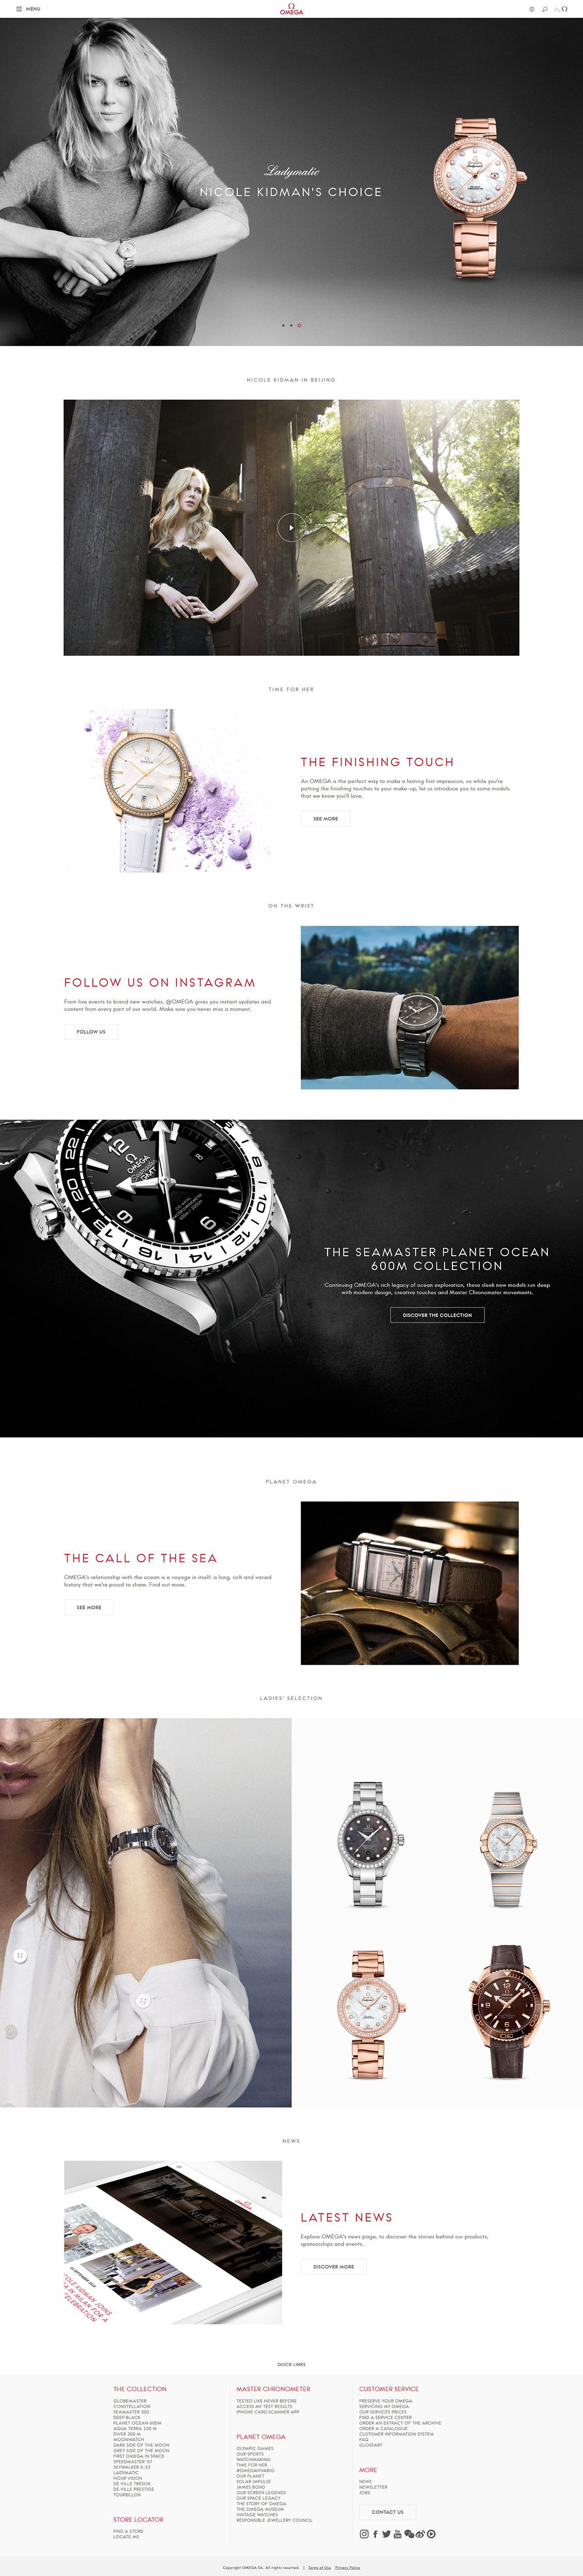 国外omega欧米茄手表网站设计